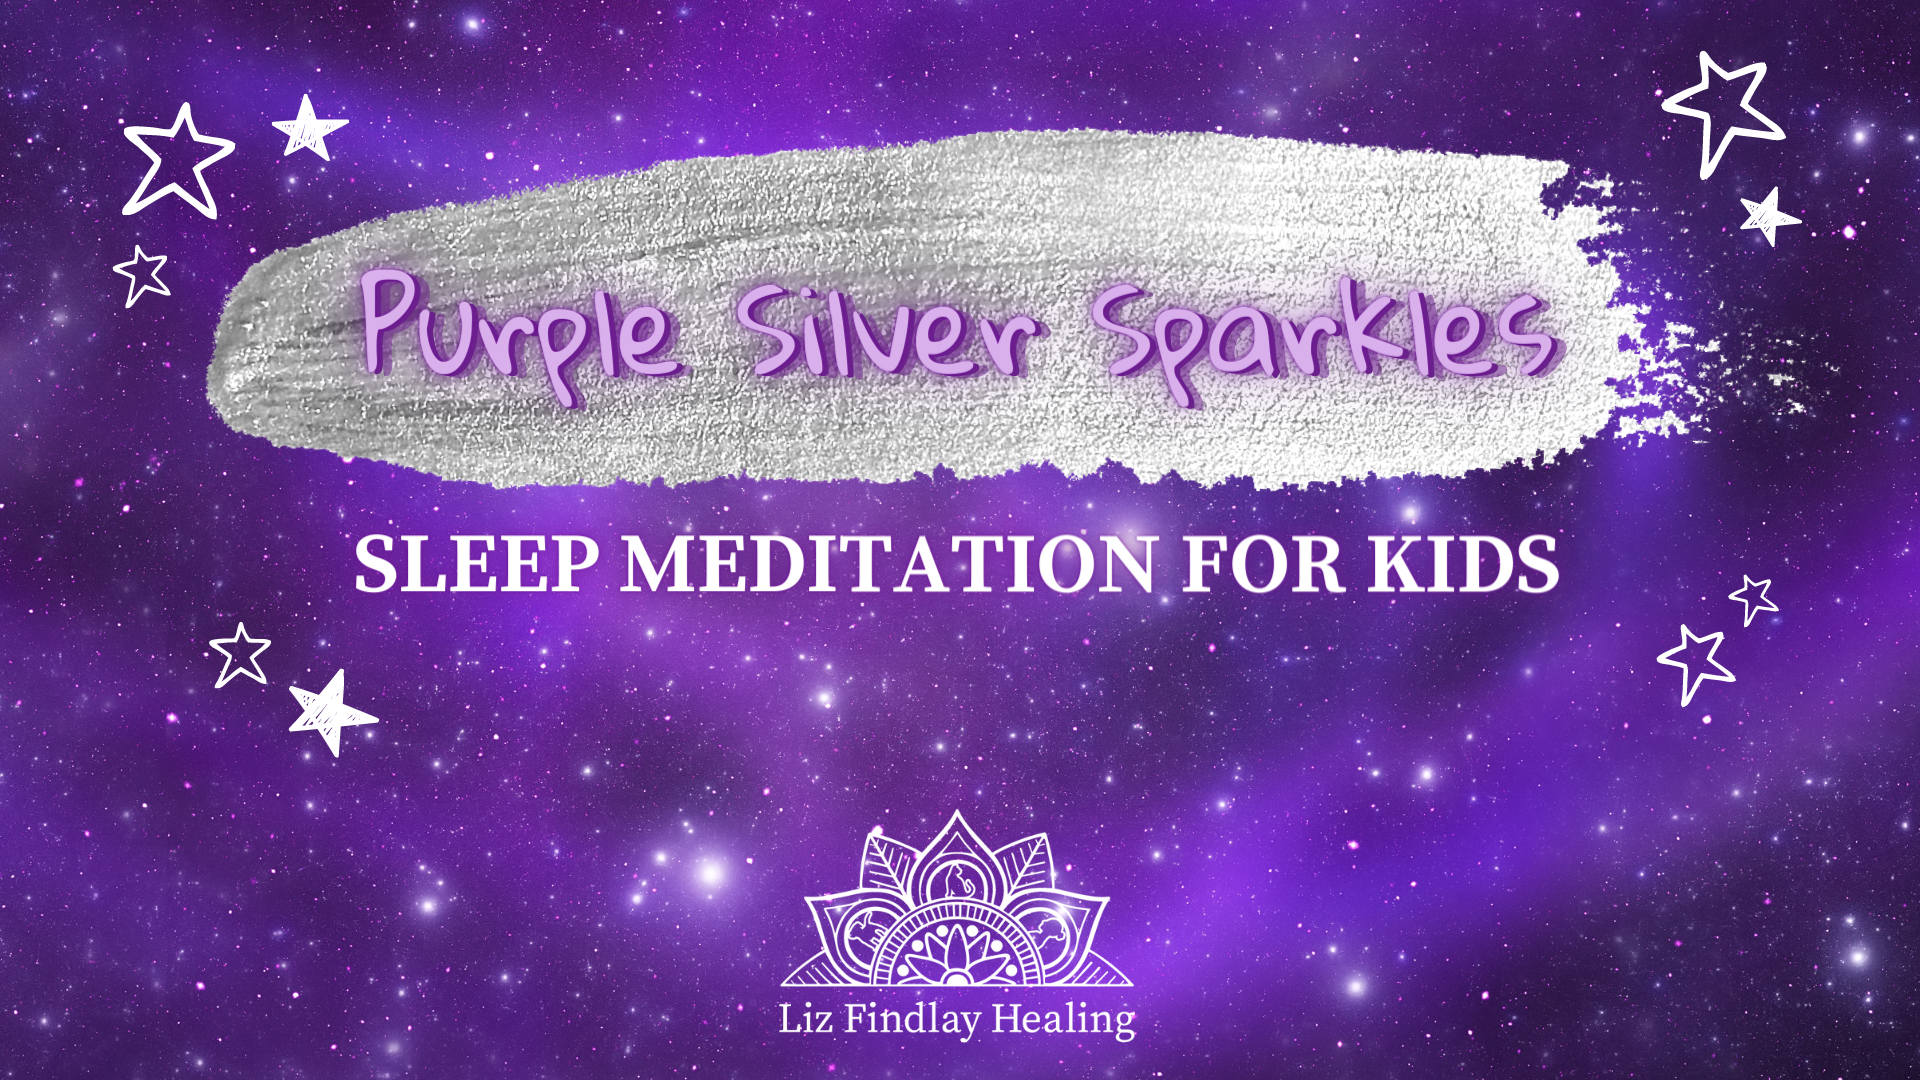 Purple Silver Sparkles - Sleep Meditation for Kids - With Liz Findlay